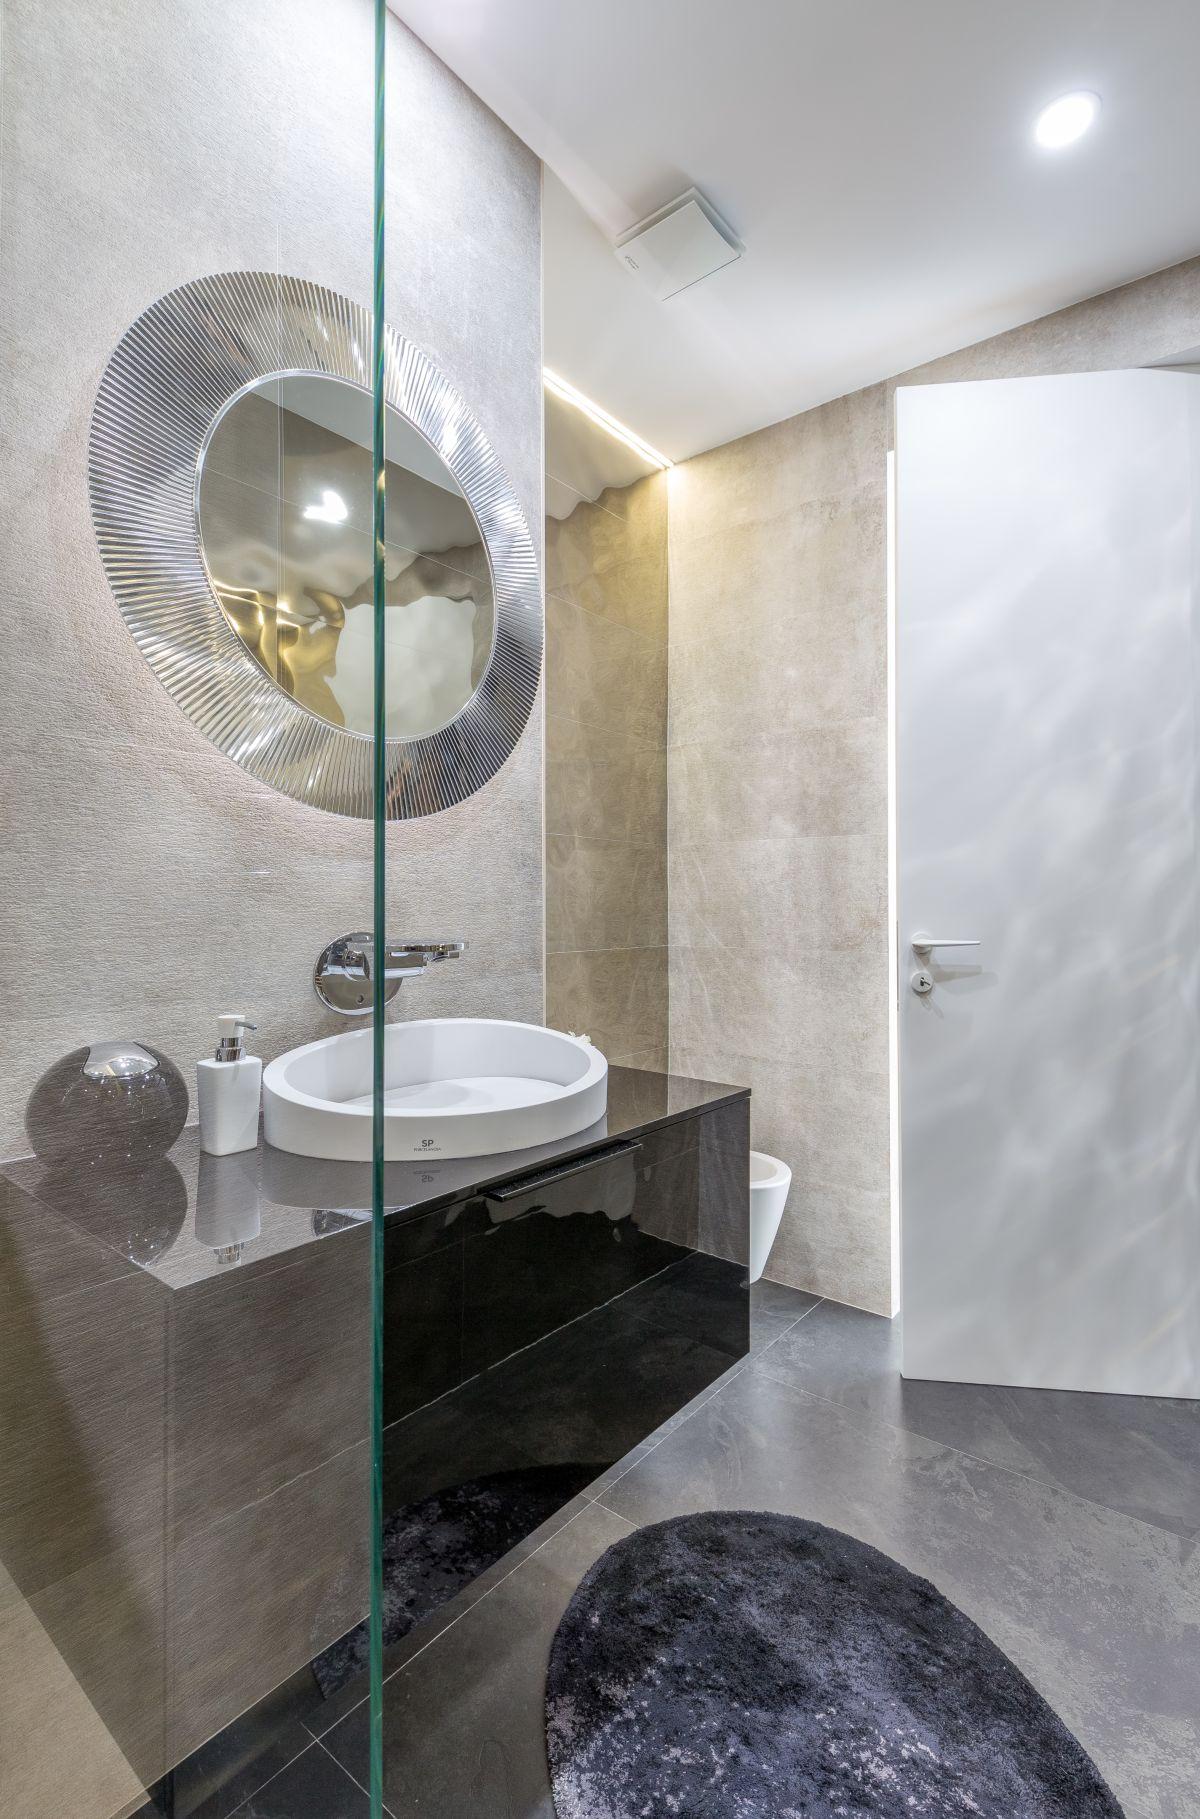 Strategic use of glass makes a bathroom feel larger.